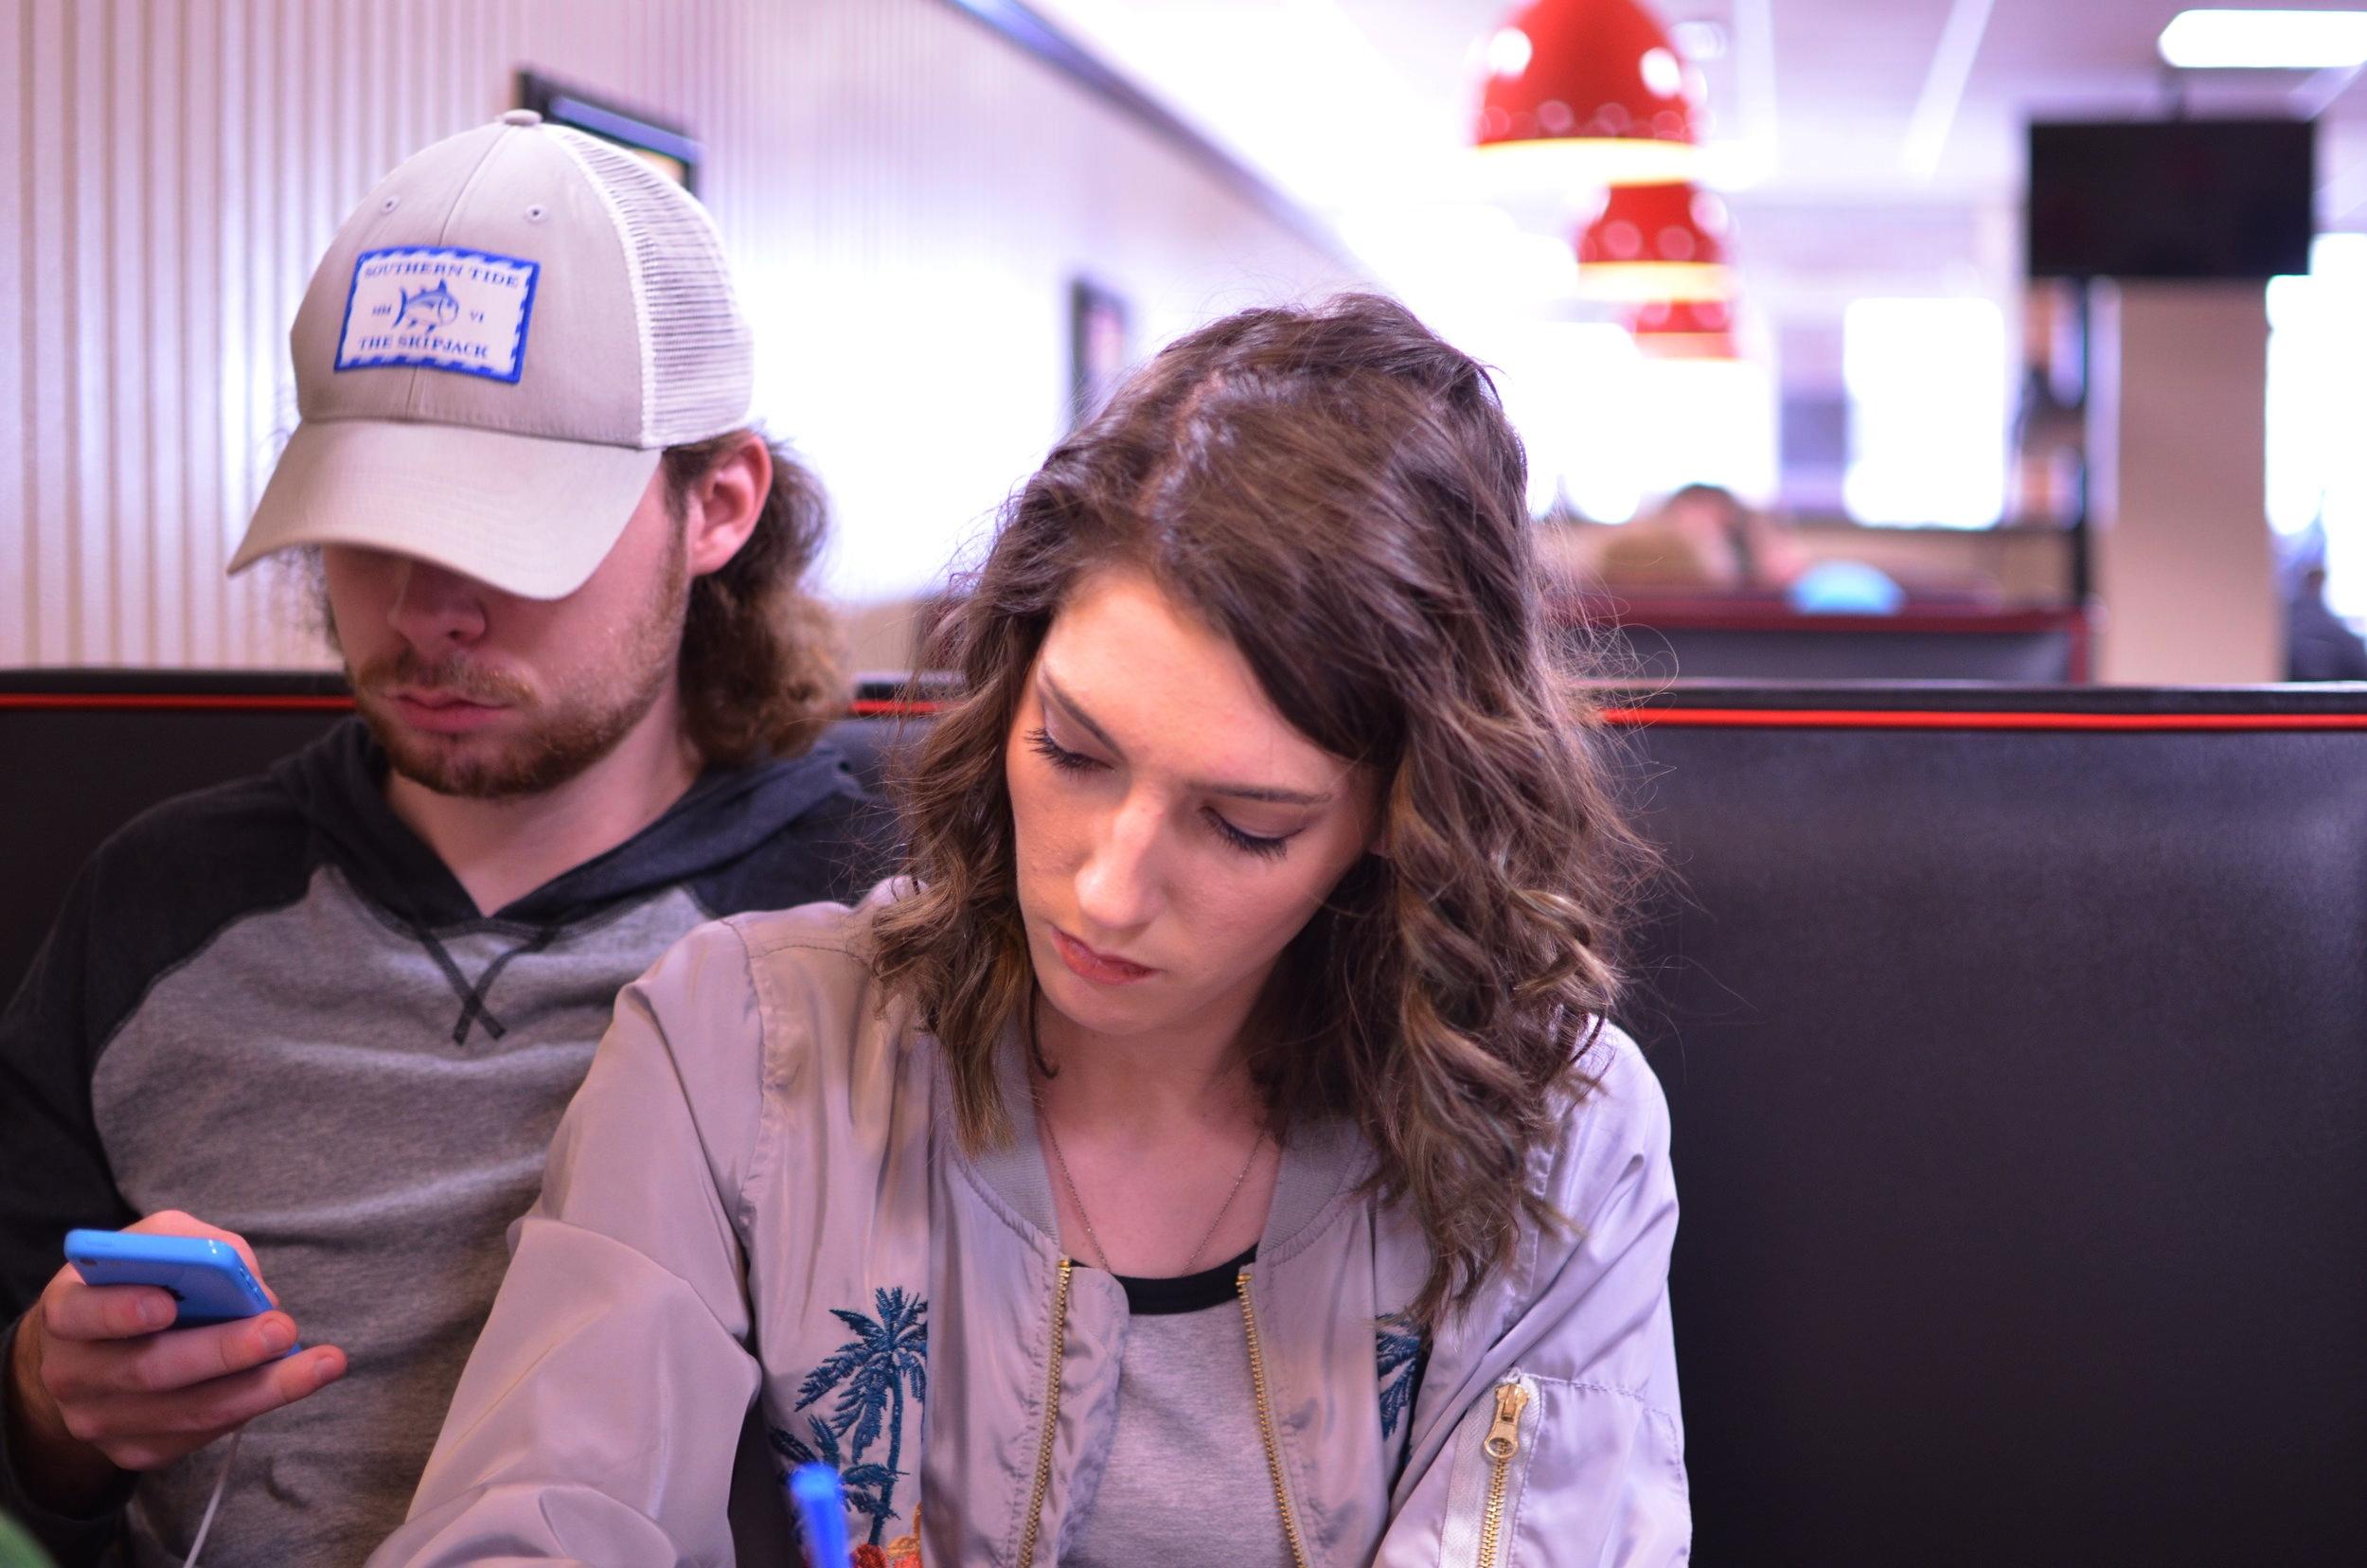 Madison Giles and Benjamin London work on school work.